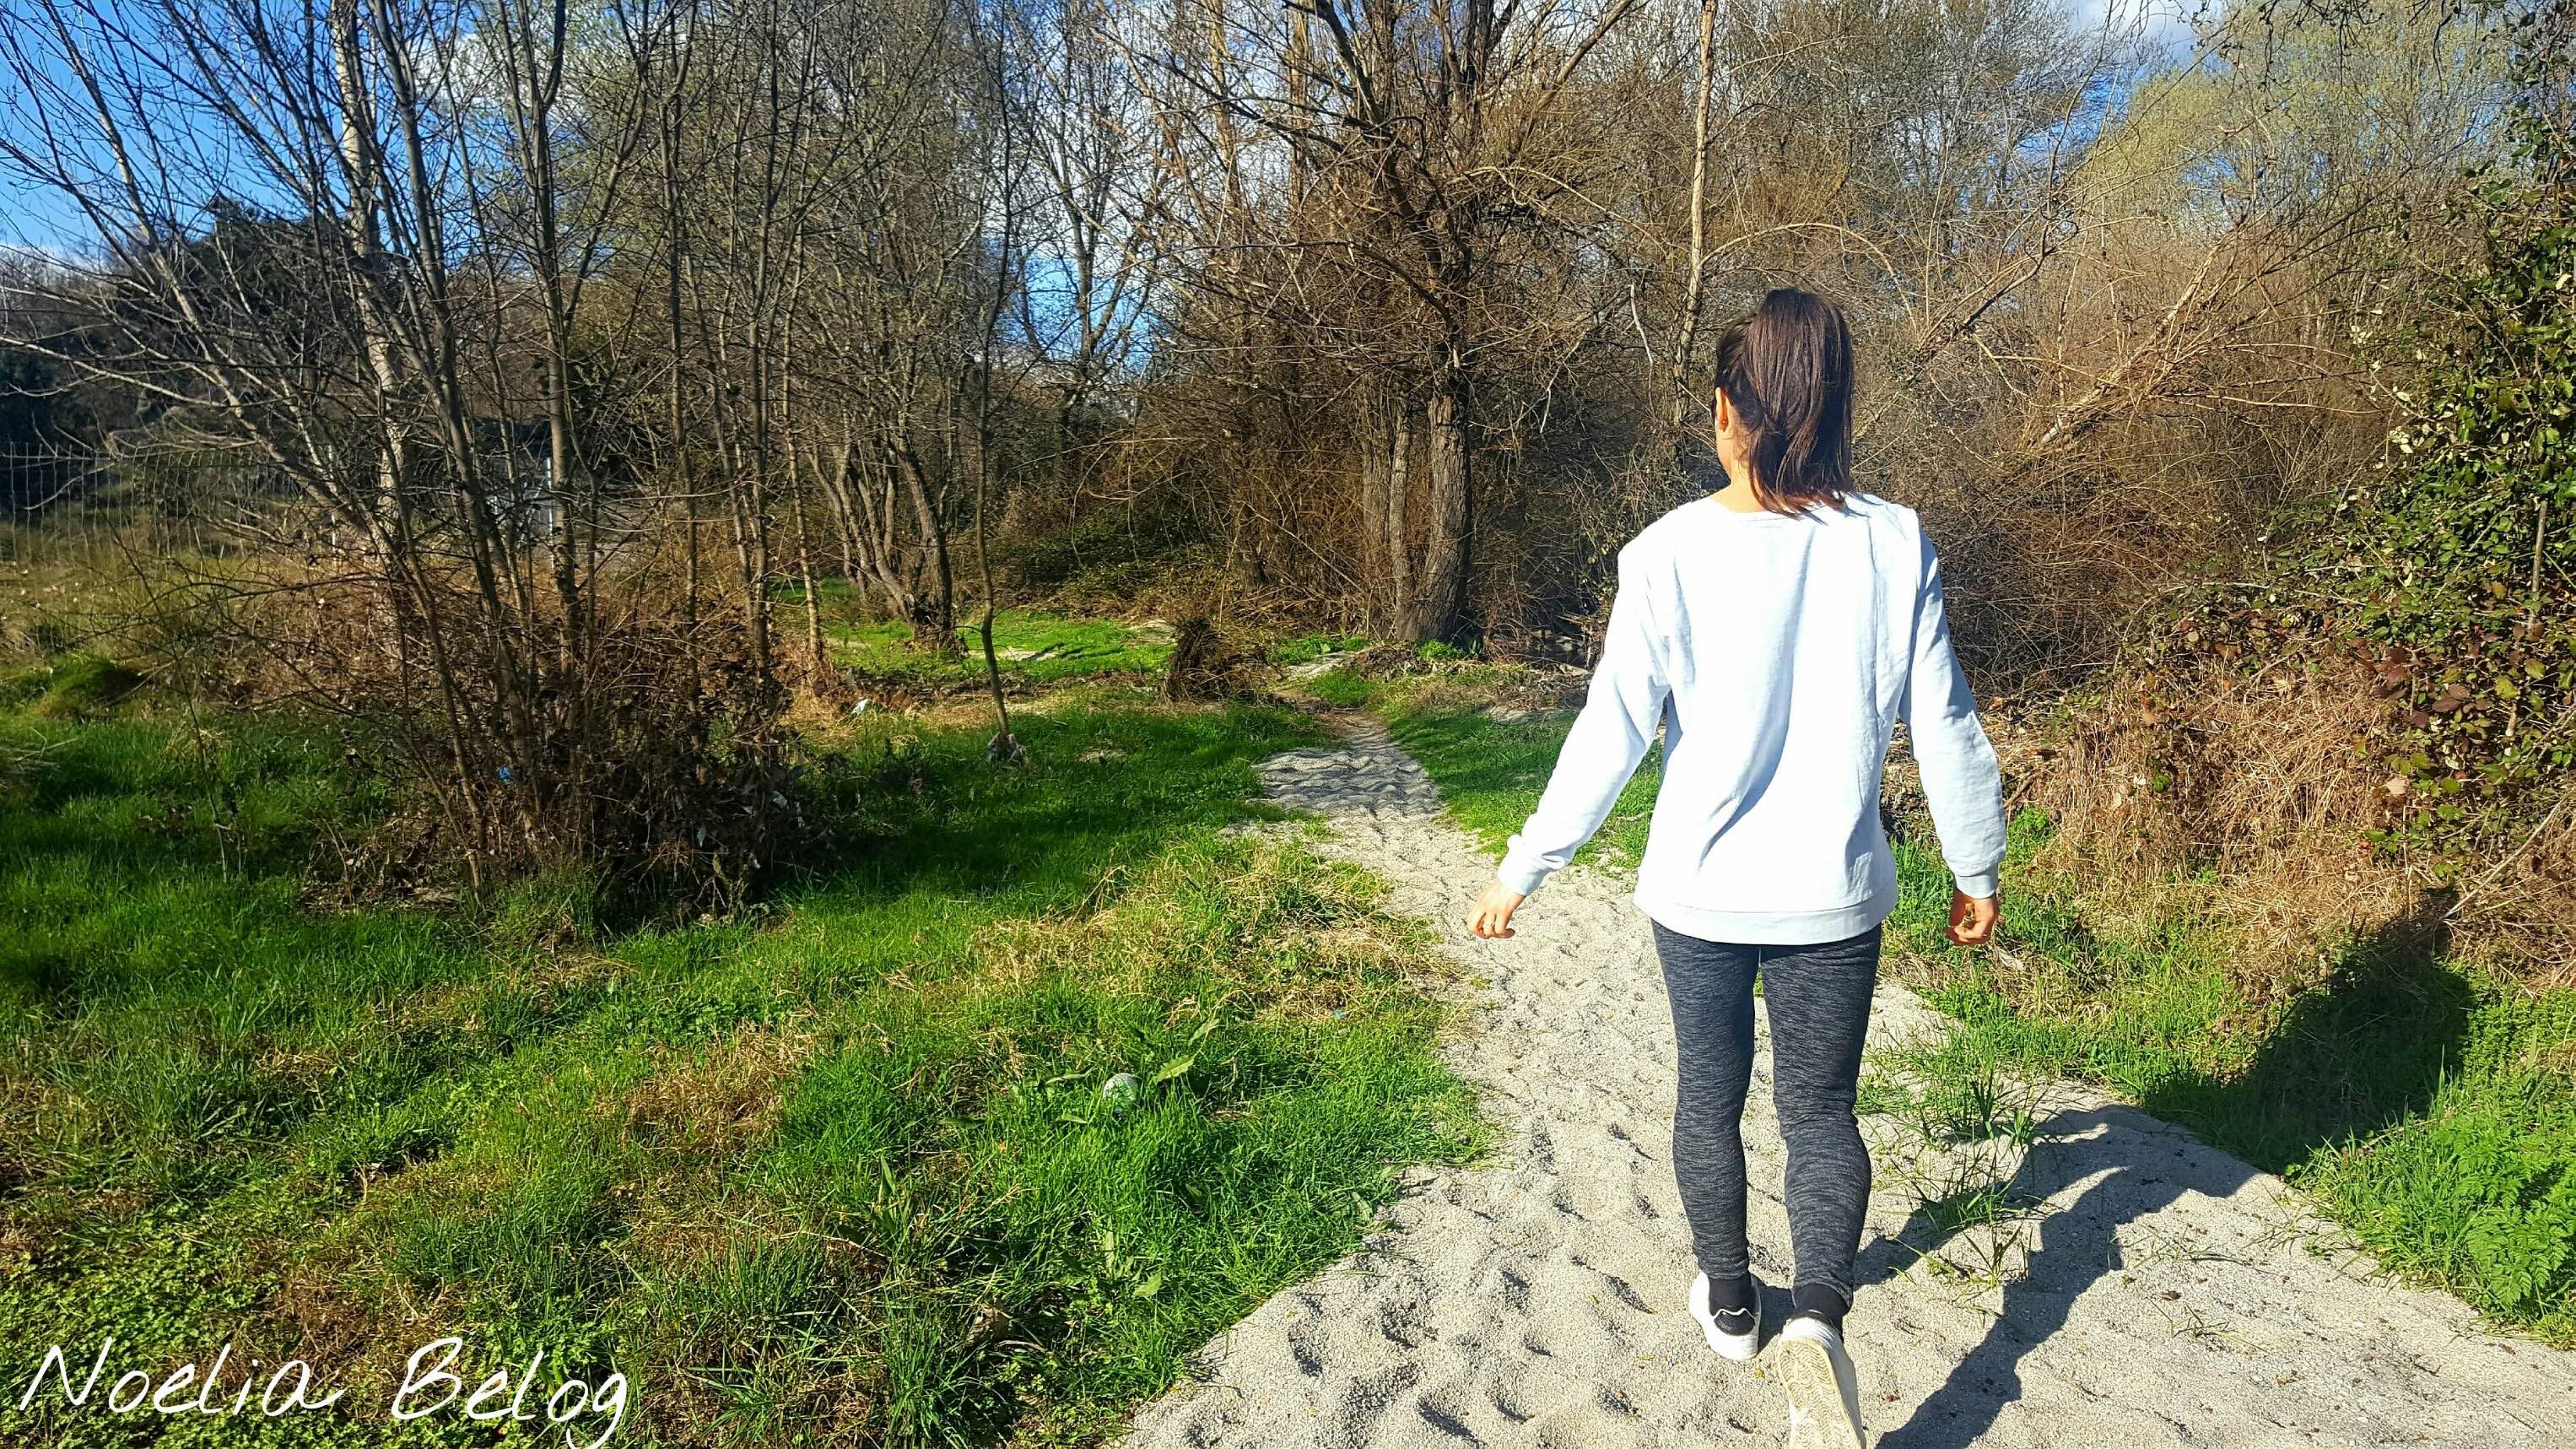 caminar 30 minutos dia habitos saludables